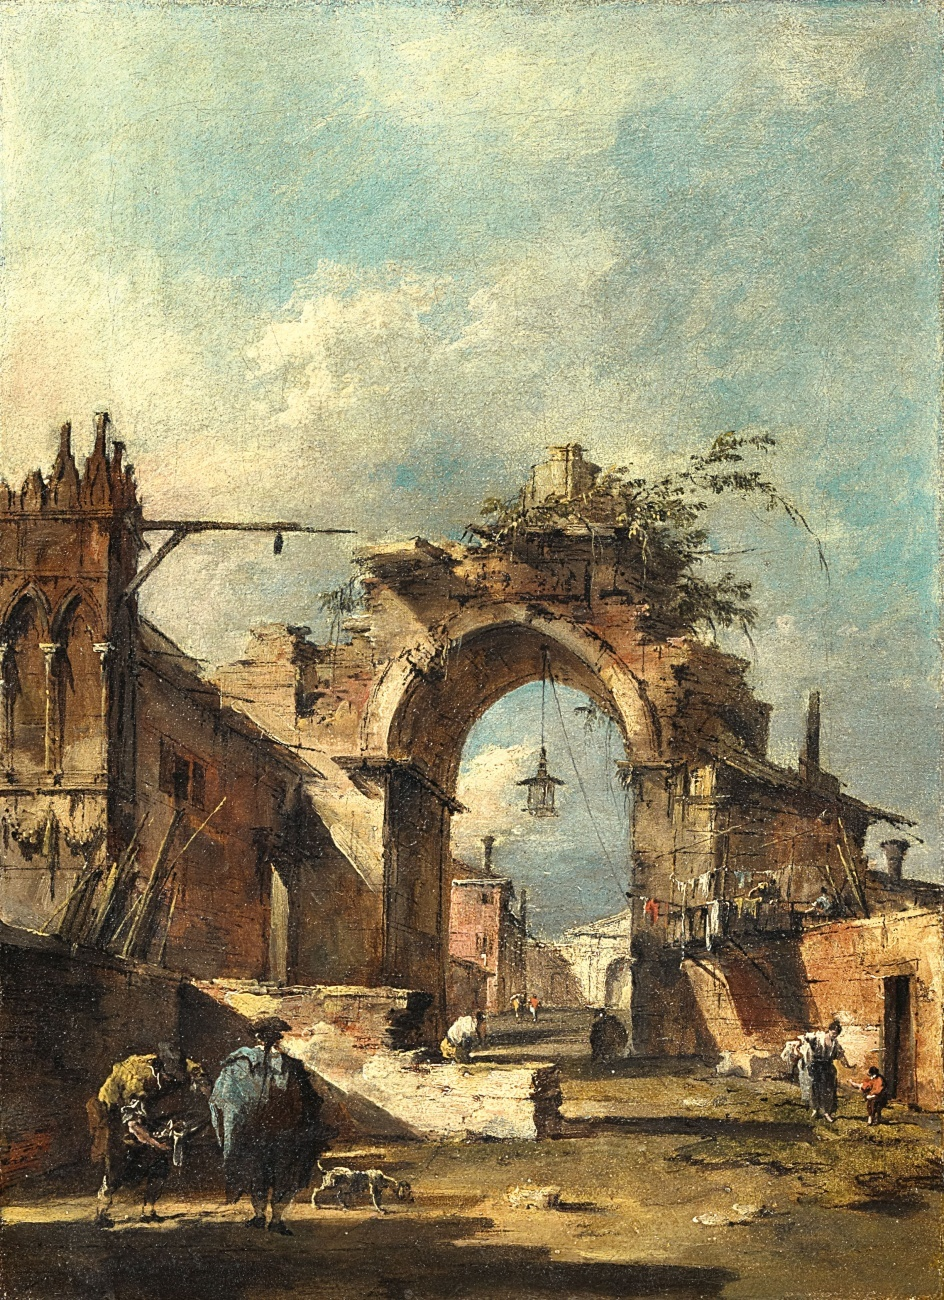 Lempertz-1108-1108-Old-Masters-and-19th-Century-Art-Francesco-Guardi-Capriccio-con-Arco-rovina...jpg